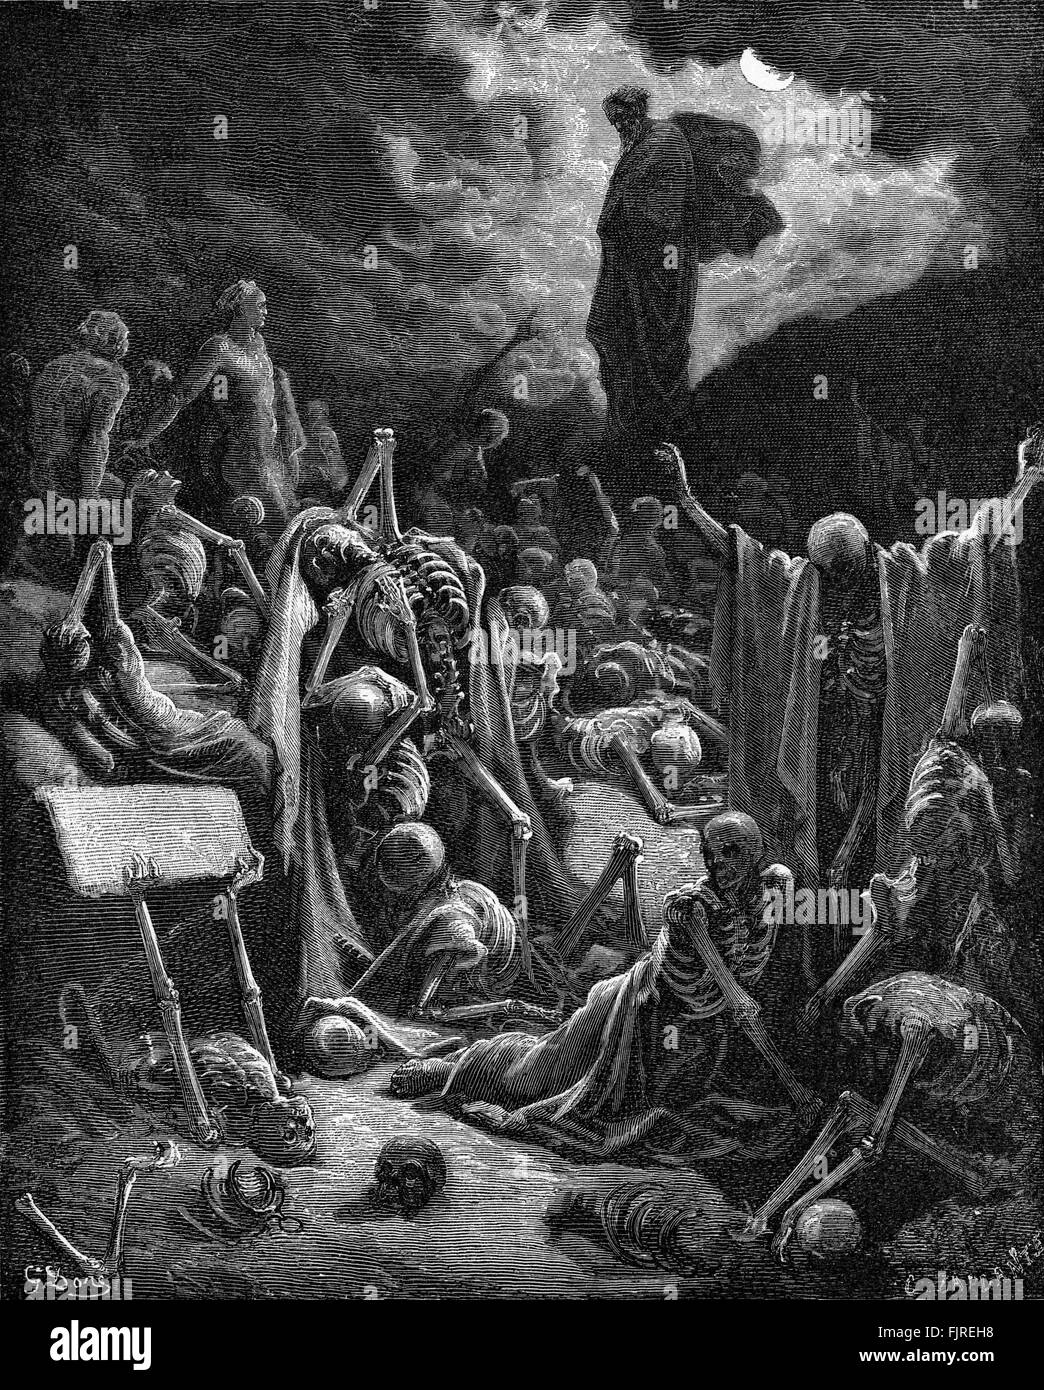 The prophet Ezekiel's vision of the Valley of Dry Bones (Ezekiel chapter XXXVII), illustration by Gustave Doré - Stock Image